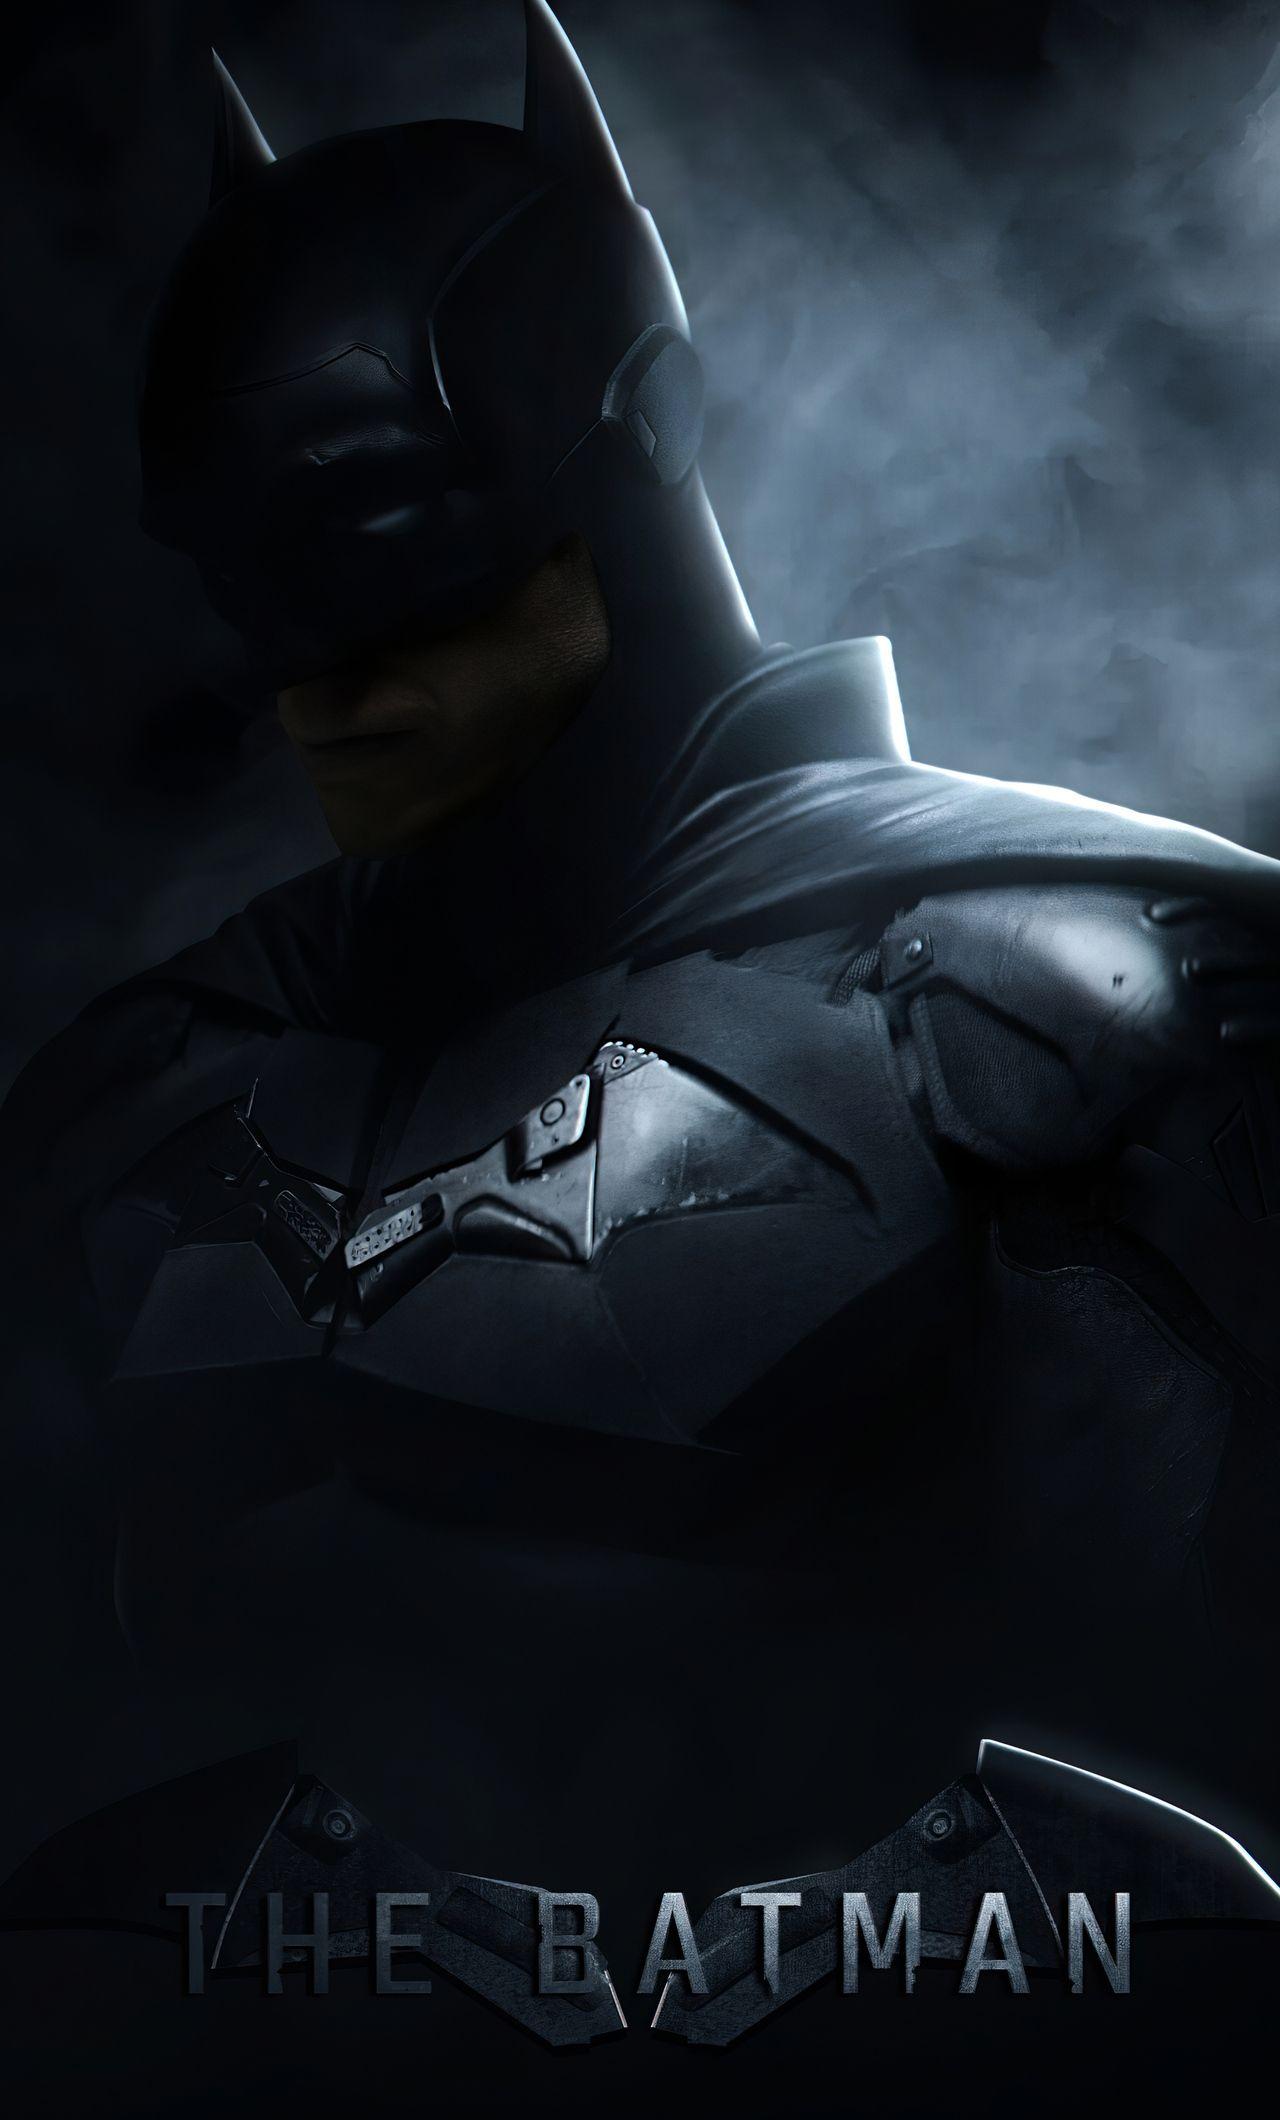 The Batman 2021 Logo iPhone Wallpapers 1280x2120